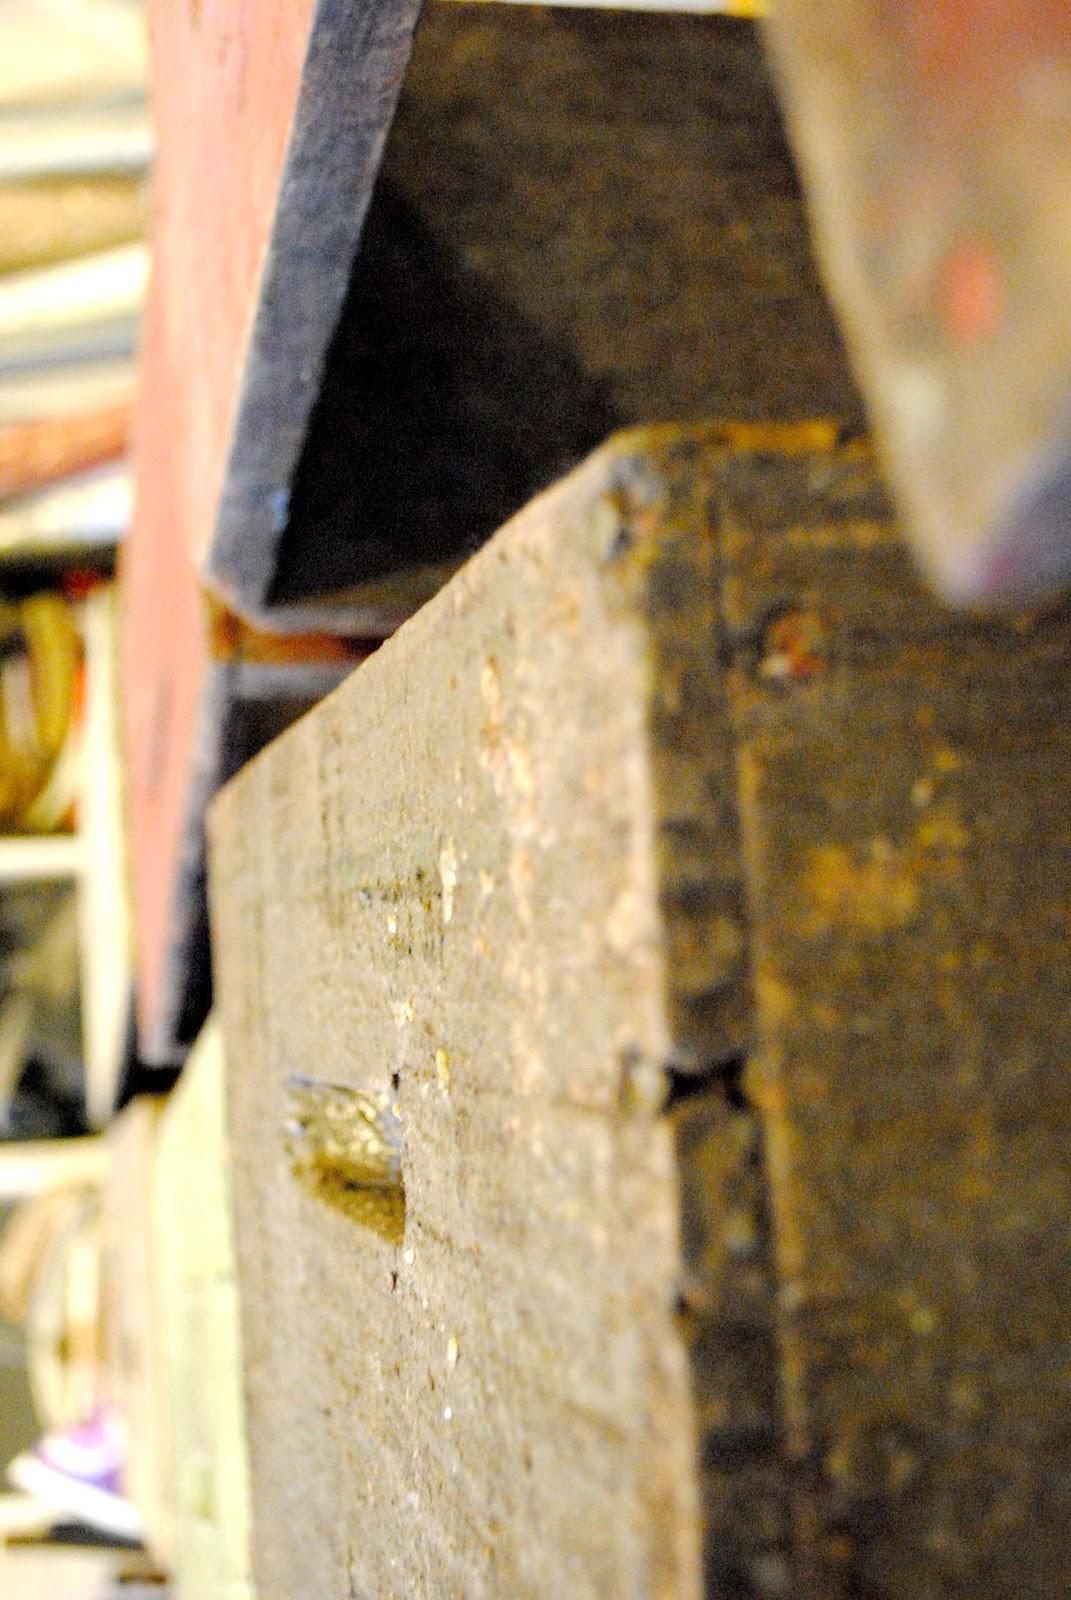 http://3.bp.blogspot.com/-34SIVmjhmv8/T9pKHtQ7AHI/AAAAAAAACqE/JeOMAsAbU7g/s1600/beehives1.jpg